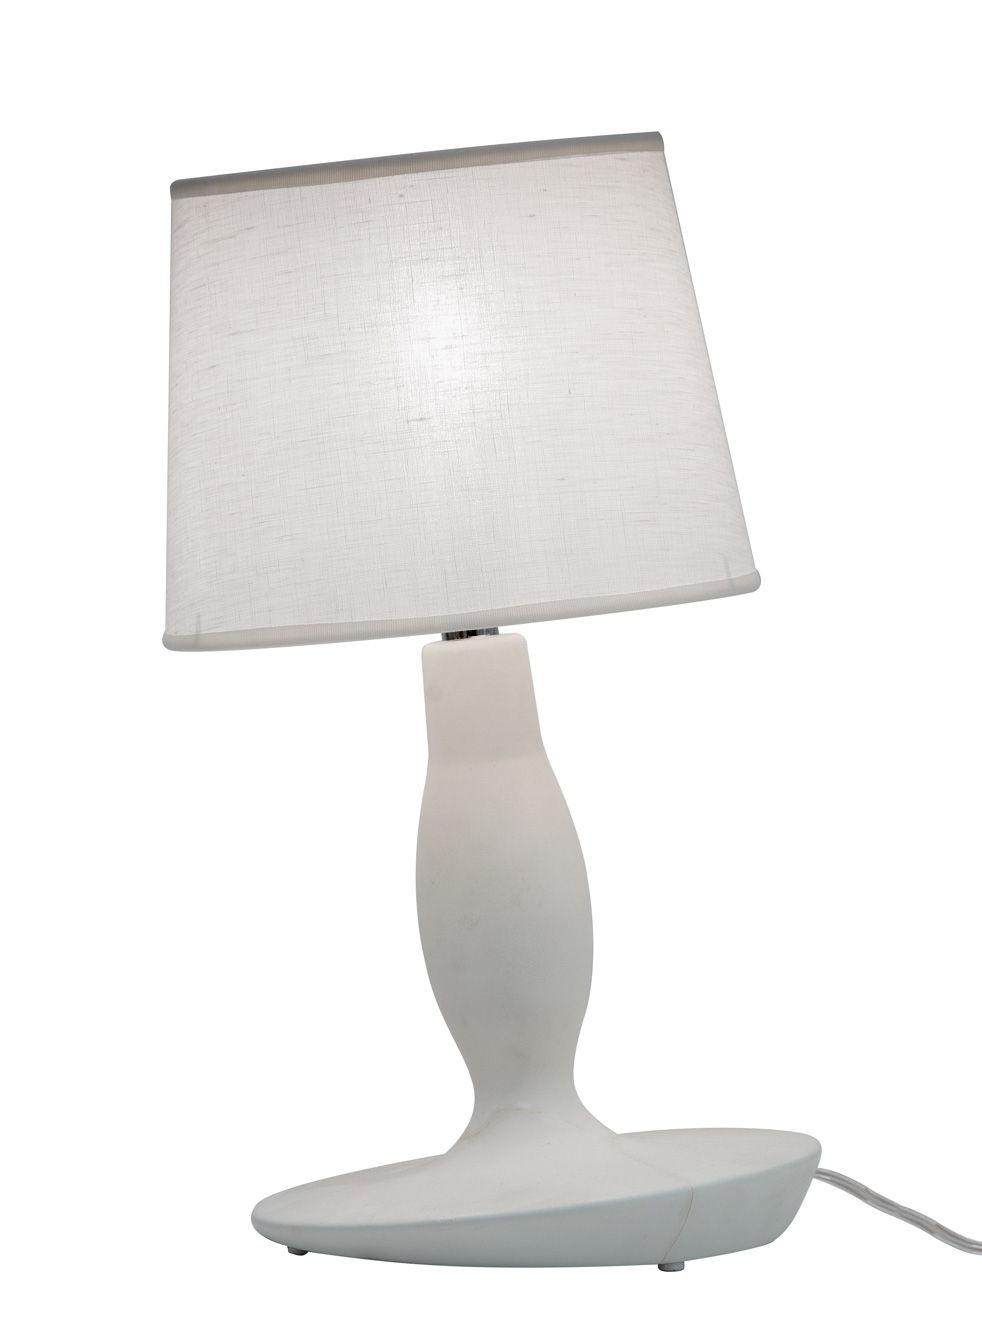 a205800099e8 Norma M Table lamp - Ceramic & Linen - Ø 22 x H 40 cm Matt white by ...